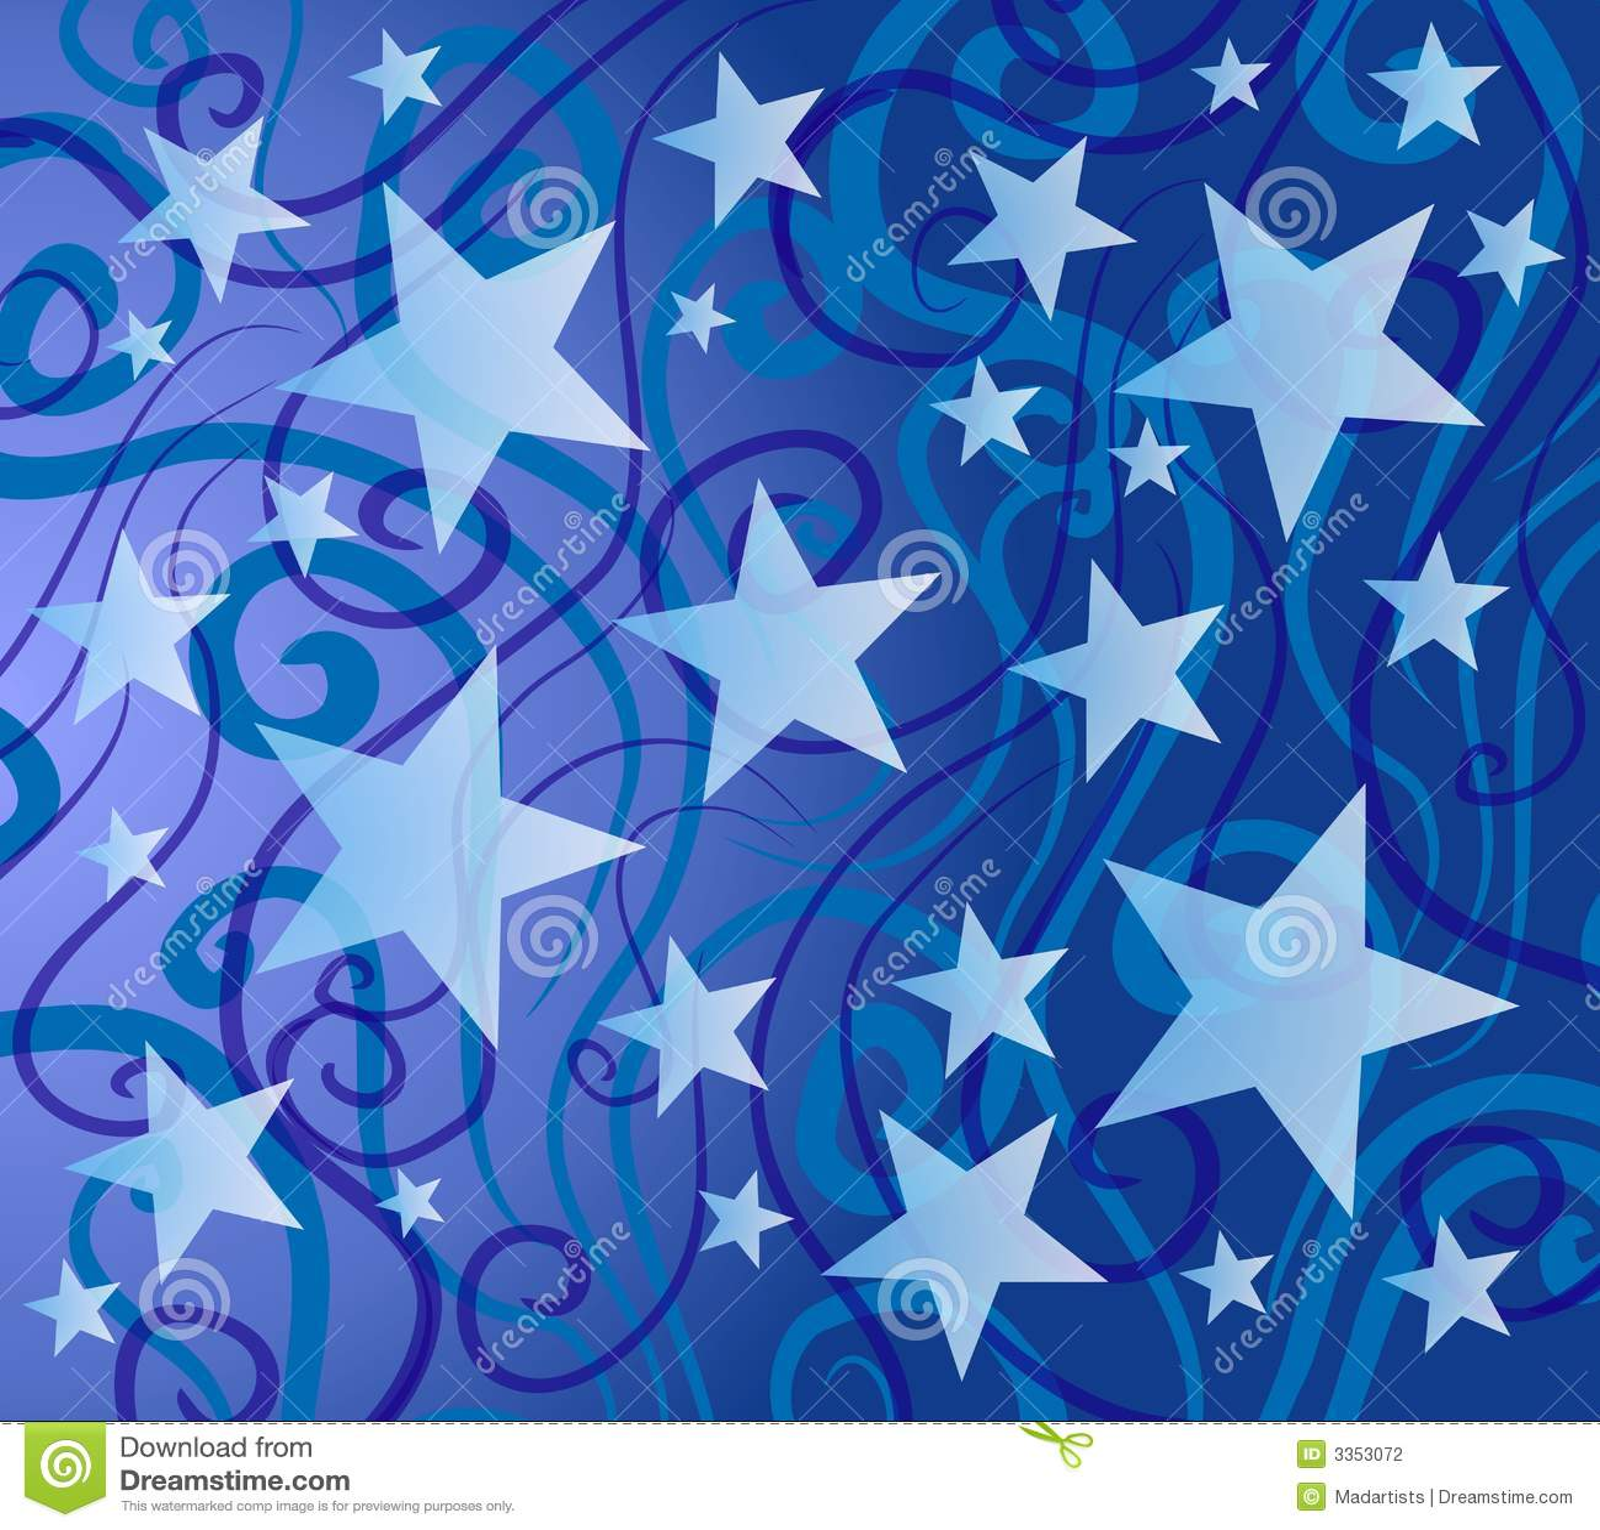 Sad Animation Wallpaper Blue Colorful Stars Pattern Stock Photography Image 3353072